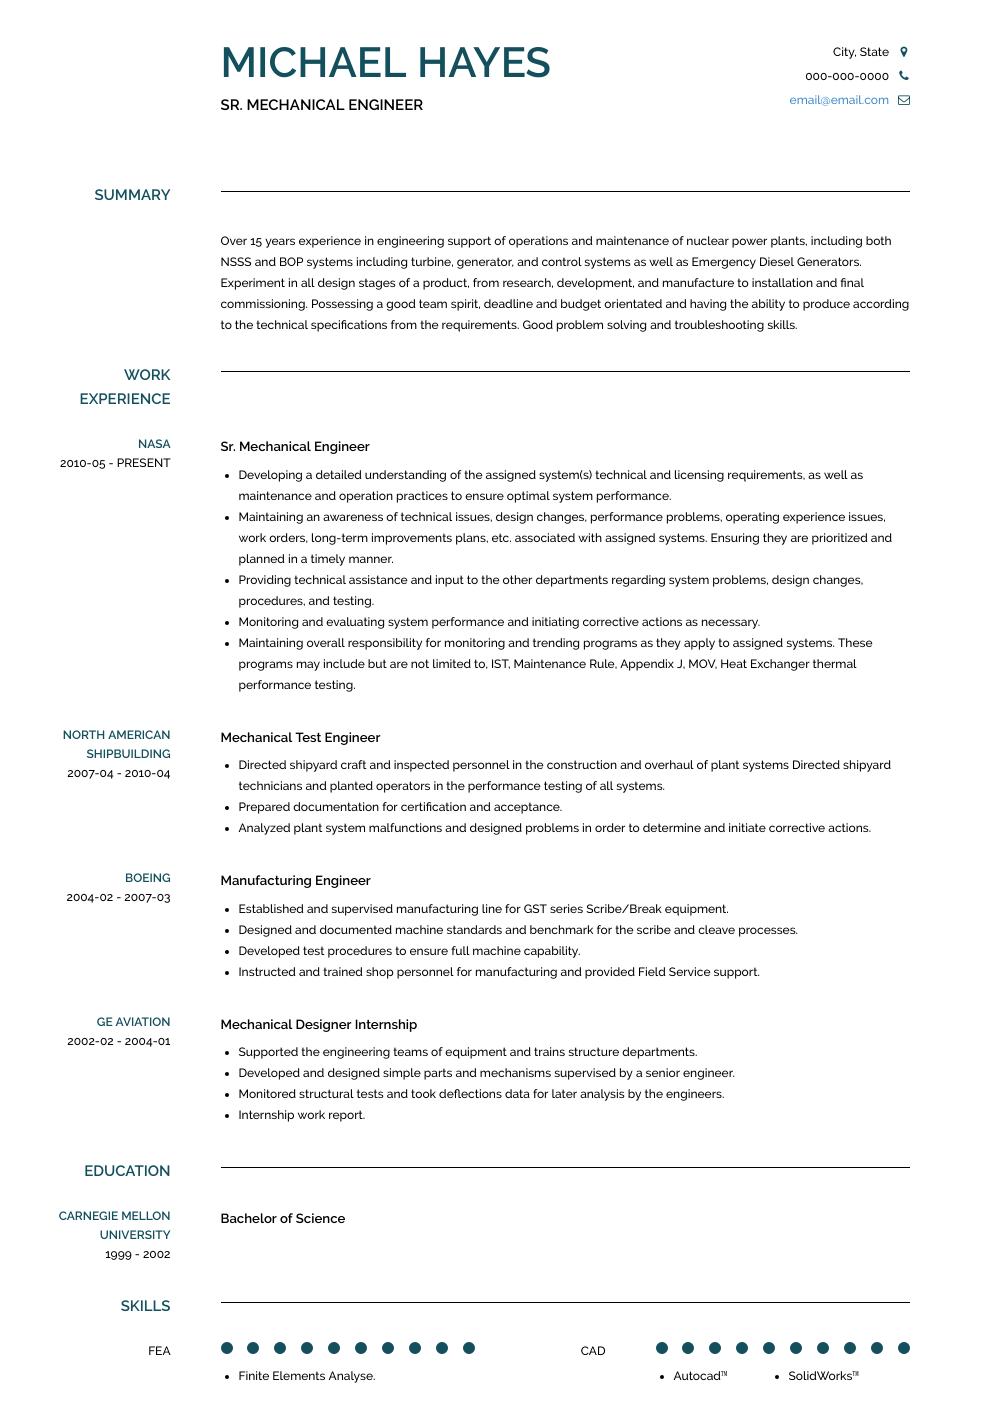 Sr. Mechanical Engineer Resume Sample and Template